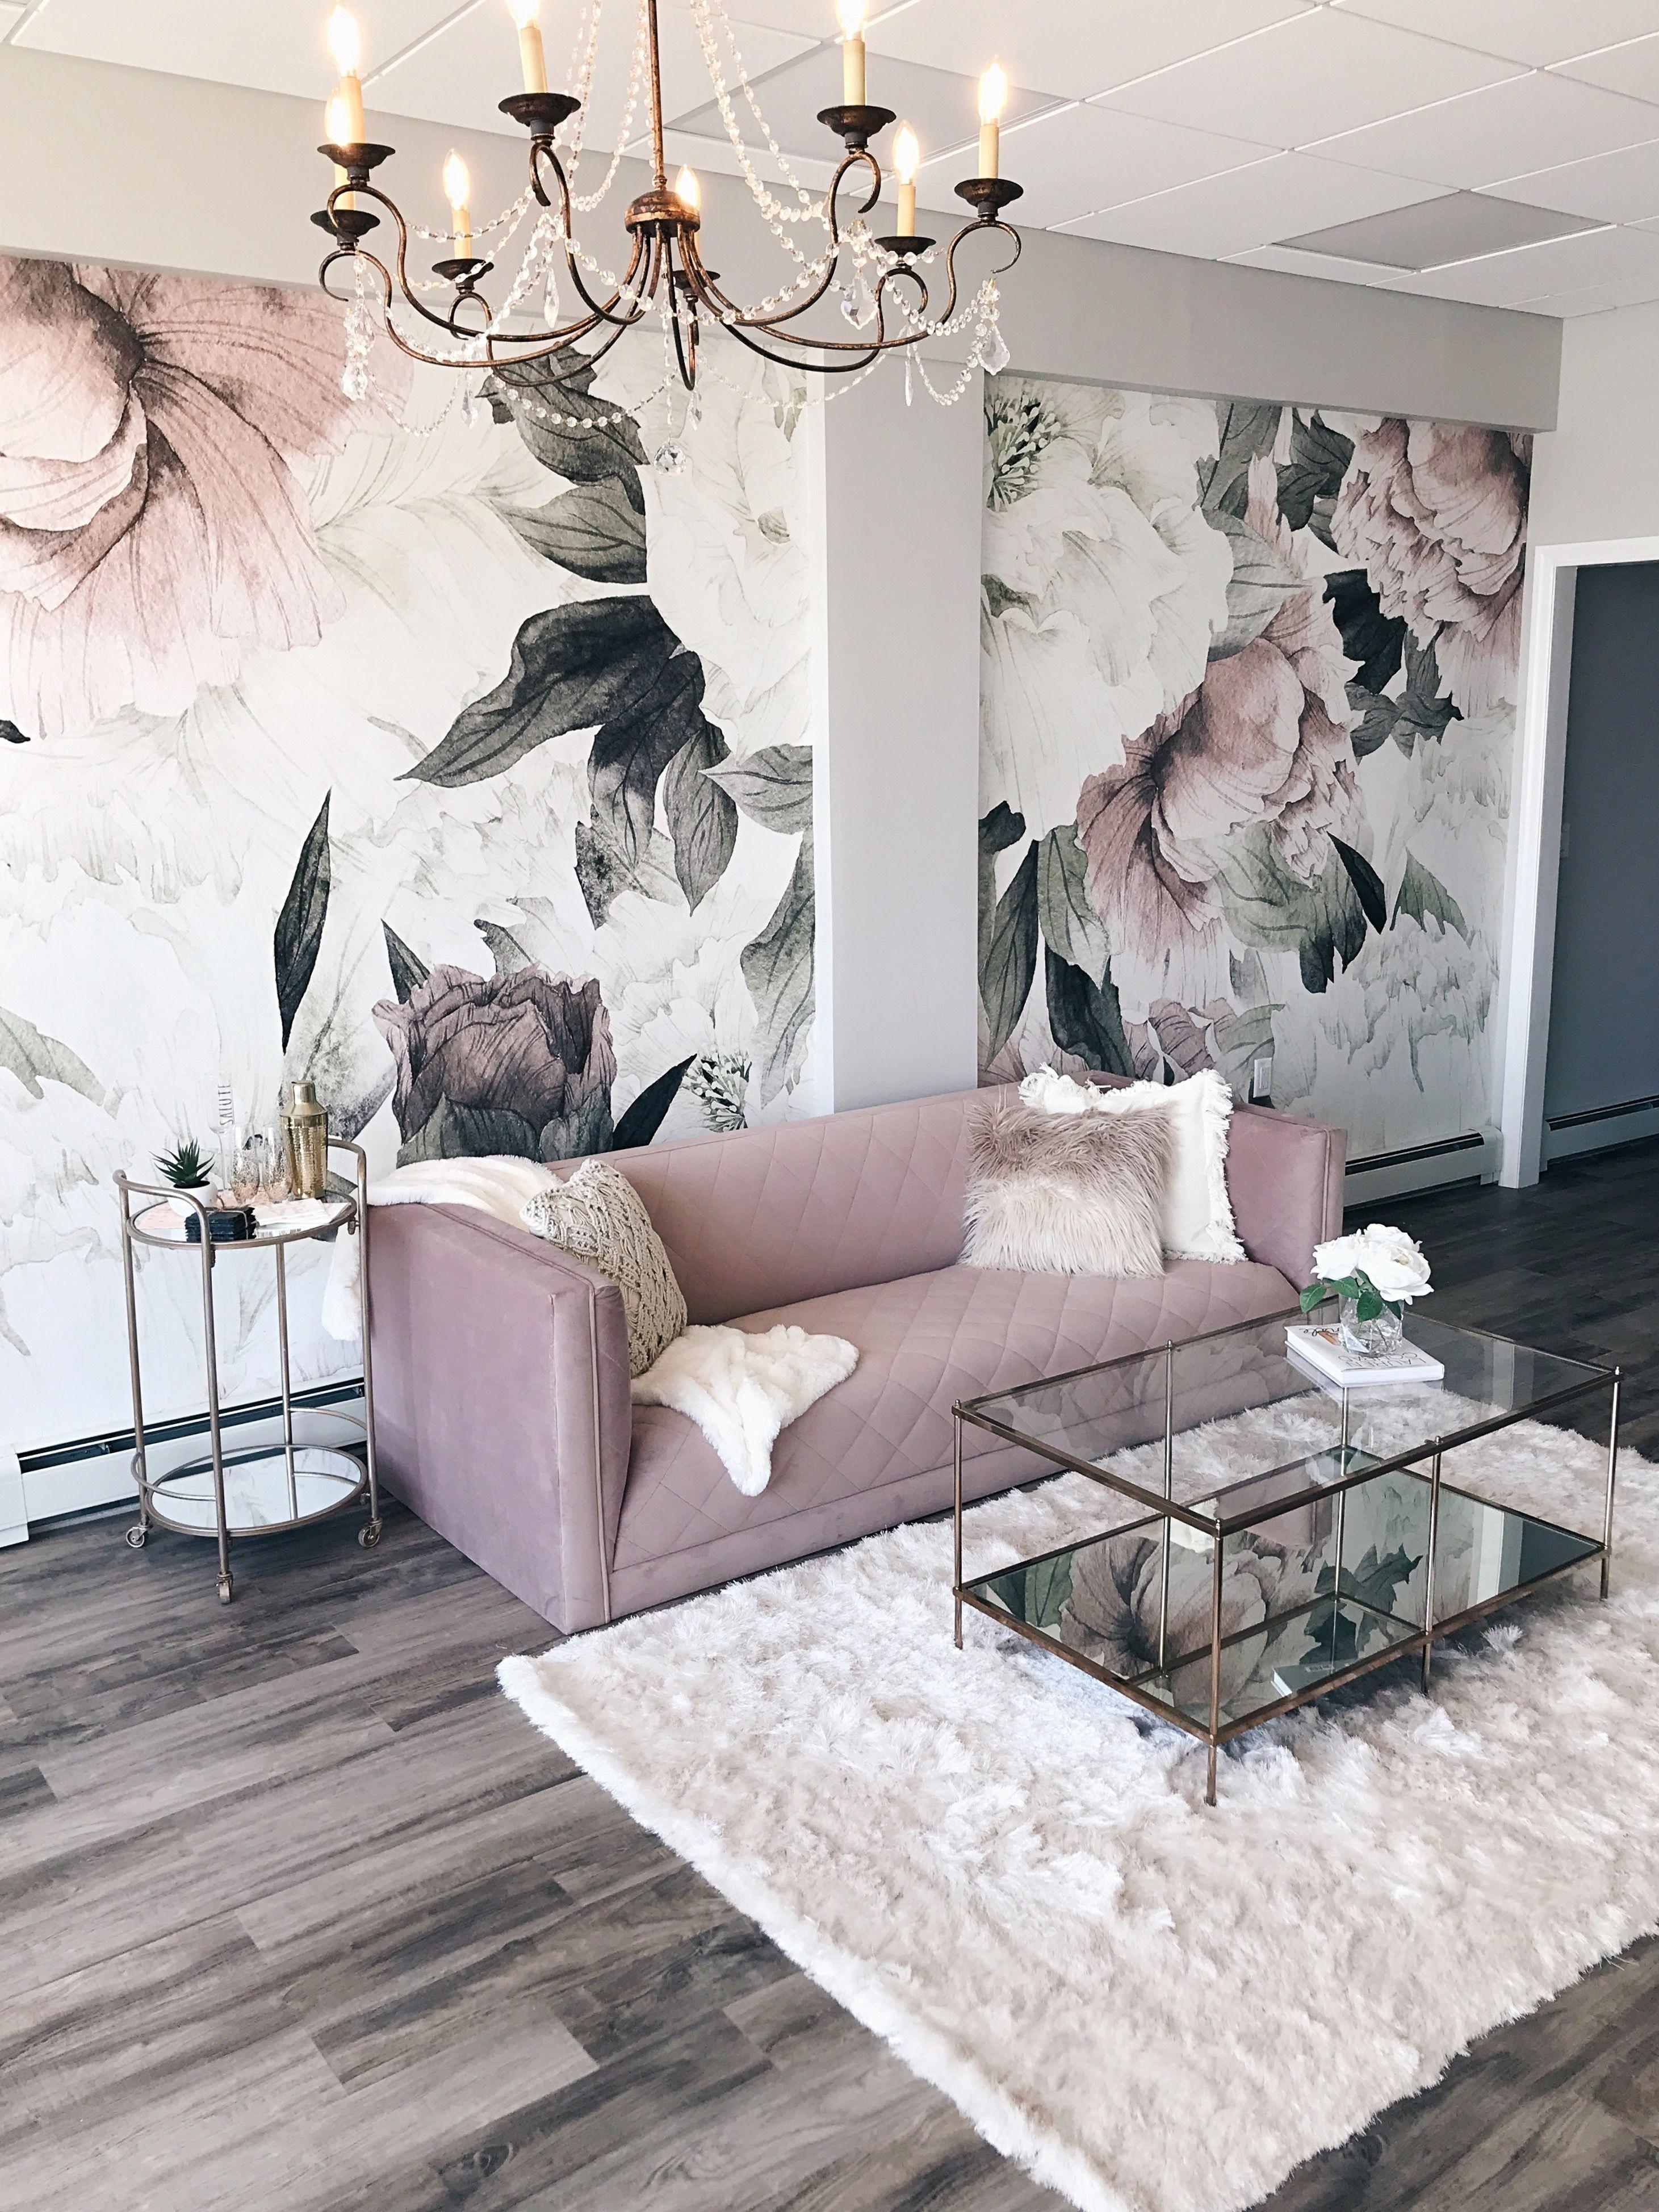 Bedroomdecor Hashtag Instagram Posts Videos Stories On Webstaqram Com Desain Interior Ide Kamar Tidur Interior